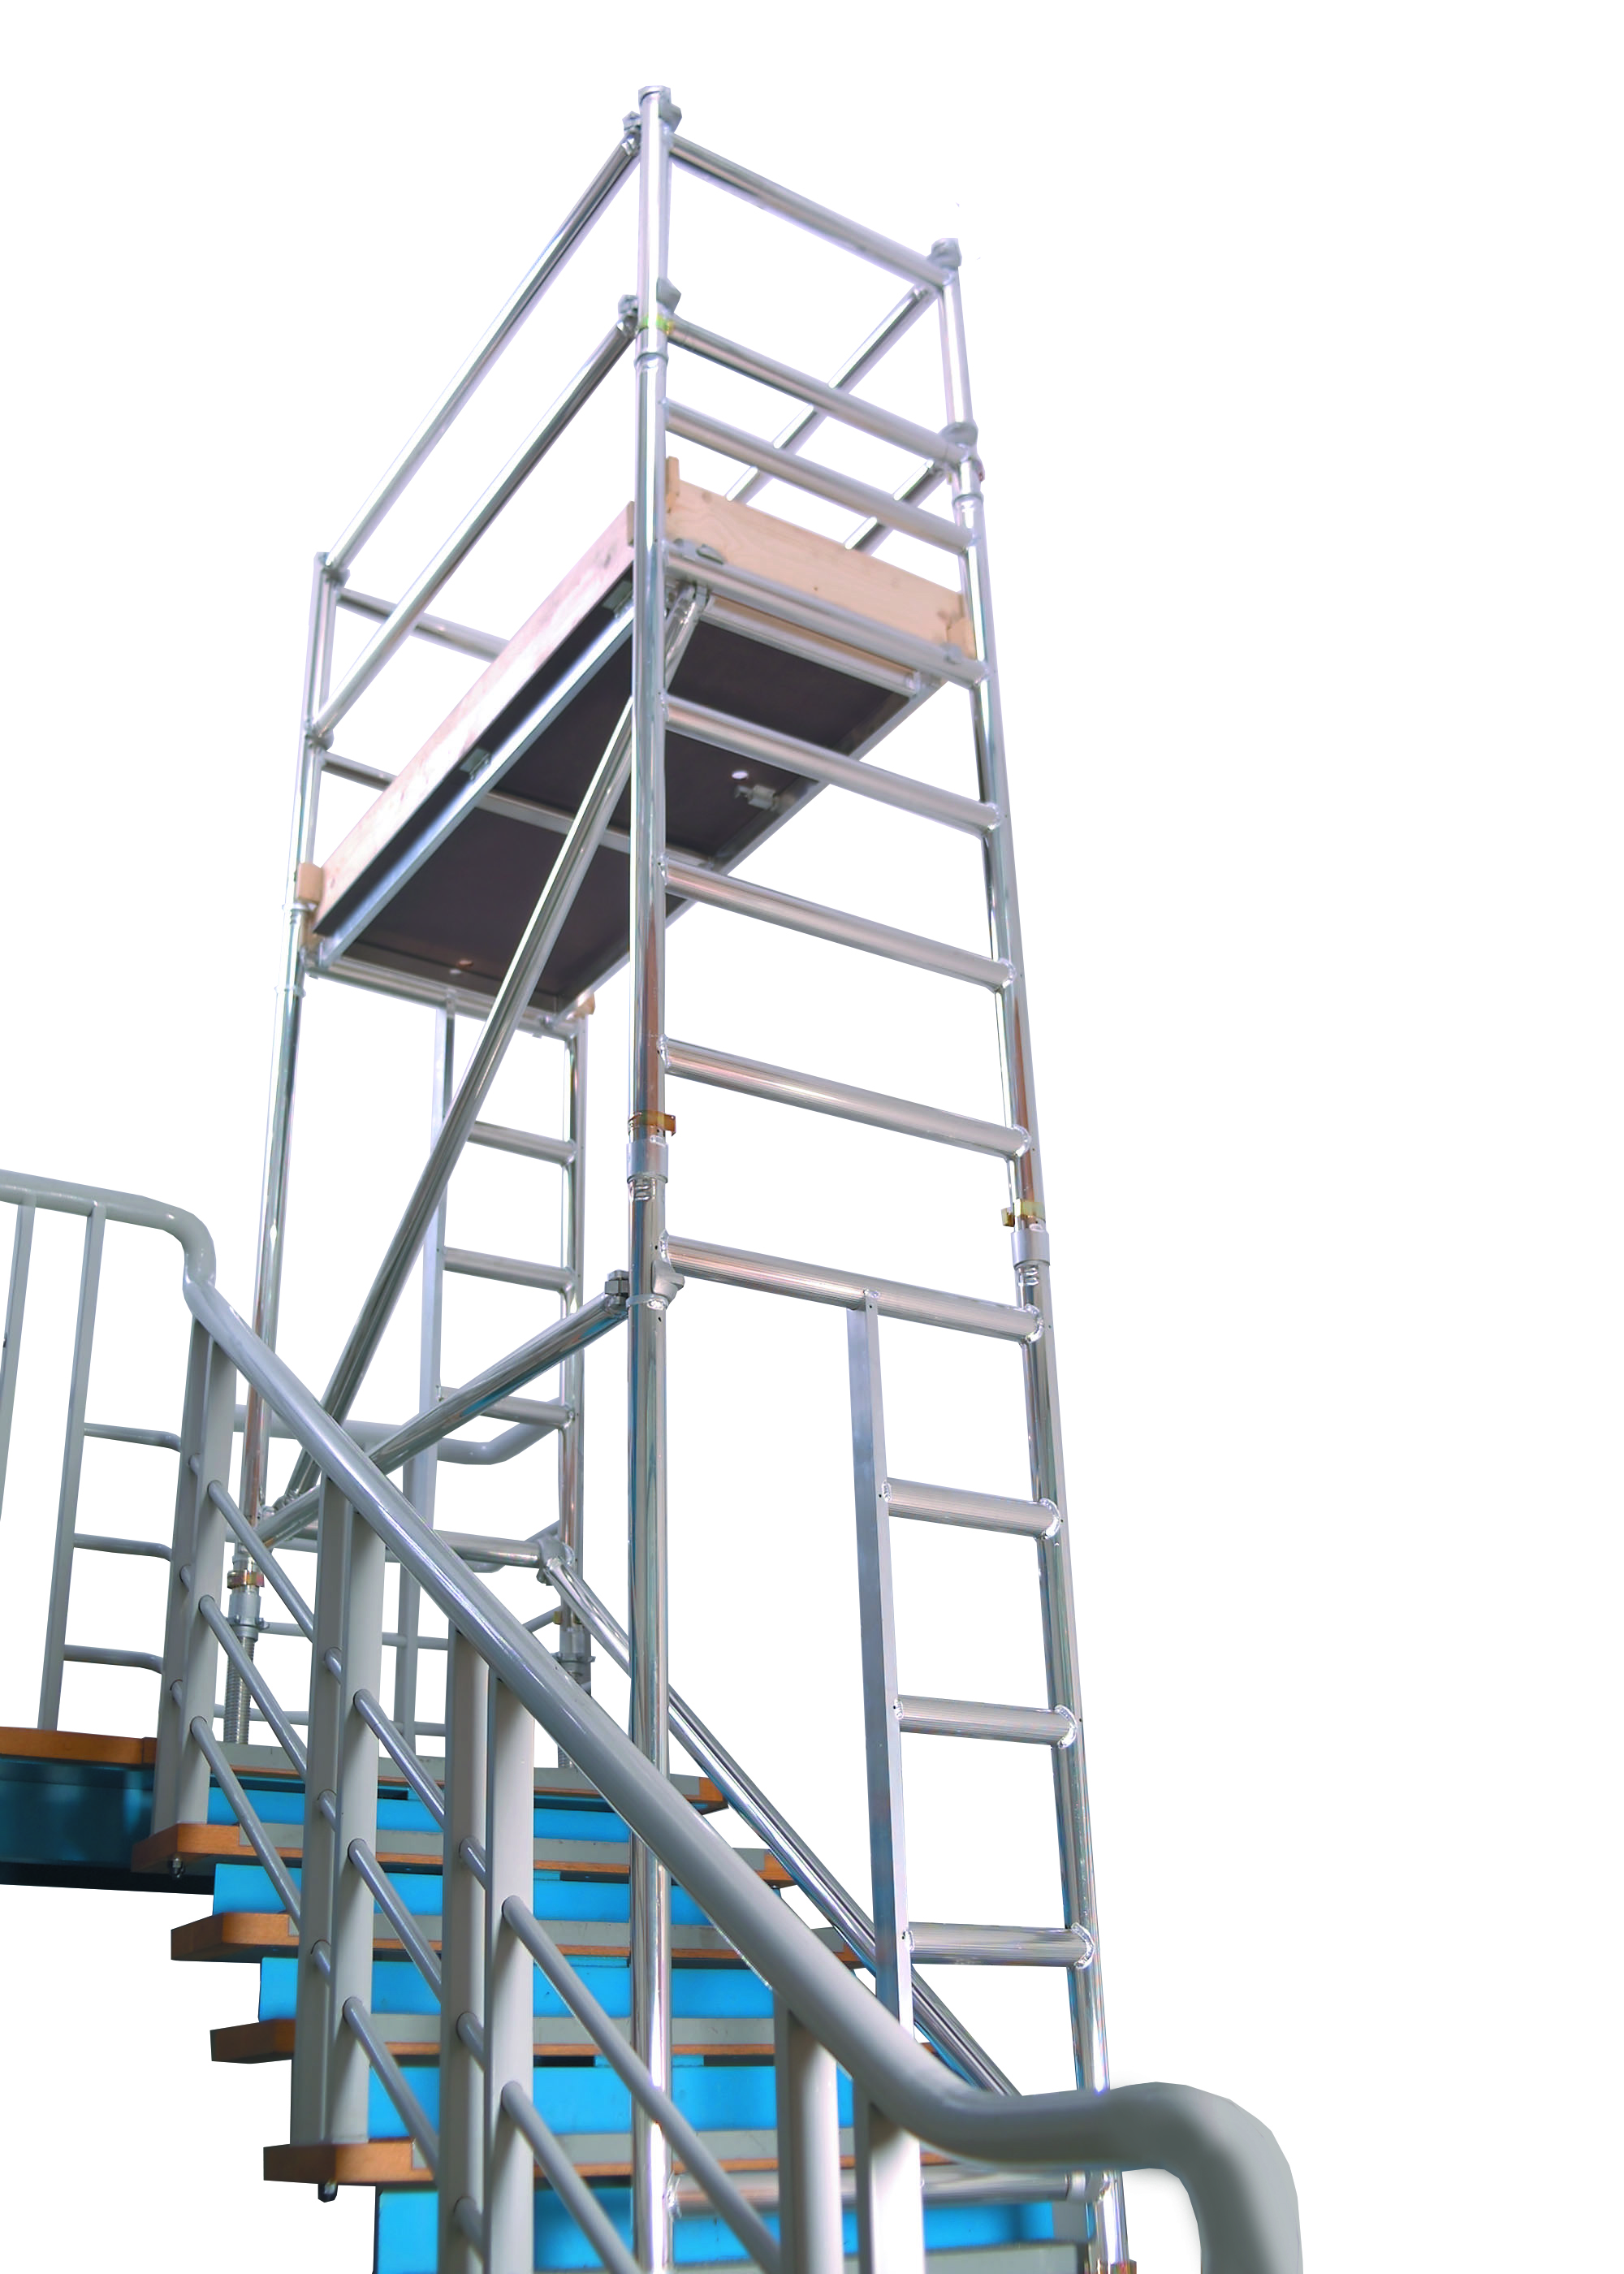 Aluminium access tower system | Euro Towers